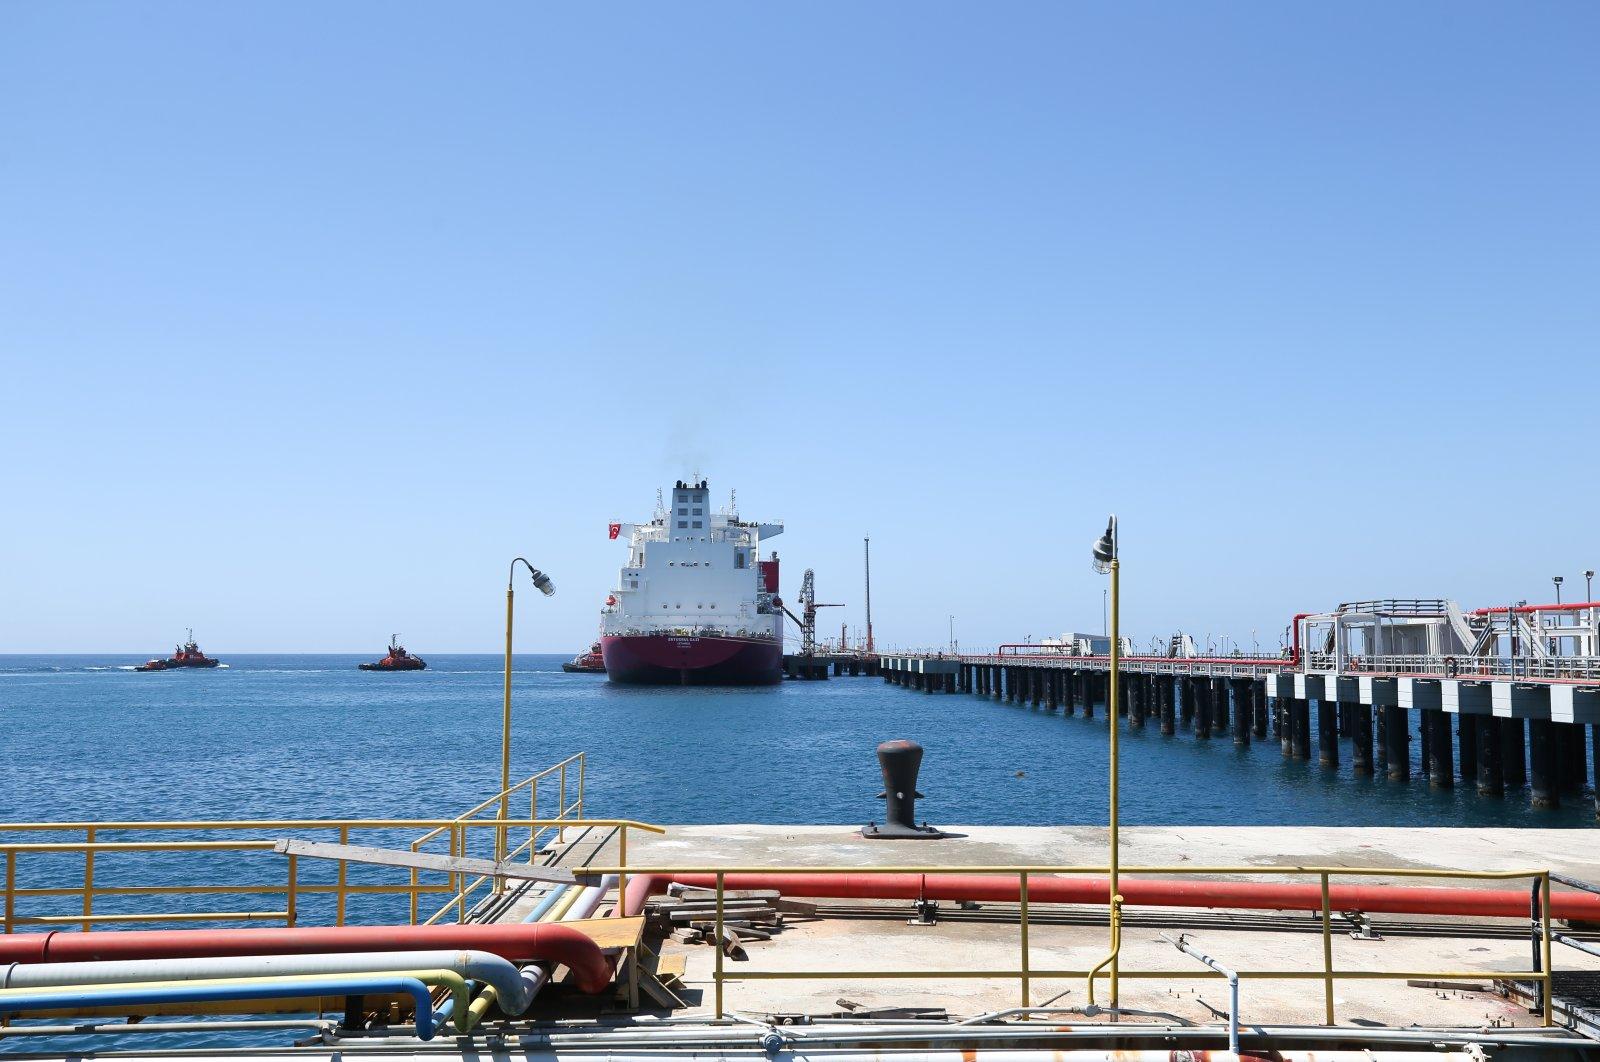 Turkey's first floating storage and regasification unit (FSRU) Ertuğrul Gazi is seen at the port in Dörtyol in Turkey's southern province of Hatay, Turkey, April 22, 2021. (AA Photo)